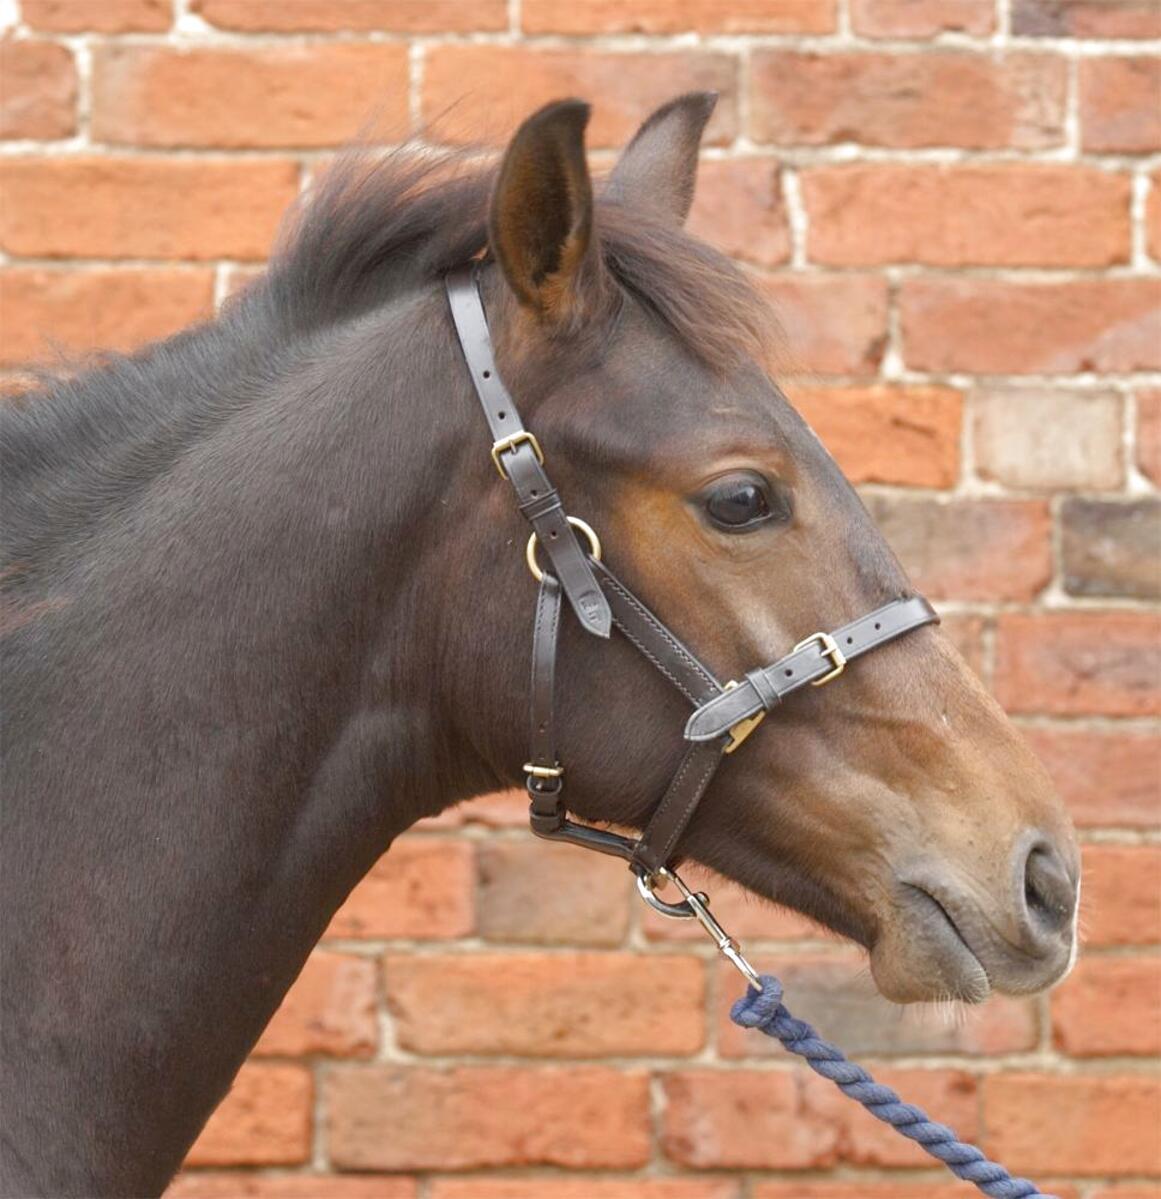 Rhinegold Adjustable Foal Miniture Pony Headcollar Head Collar AllColours Halter